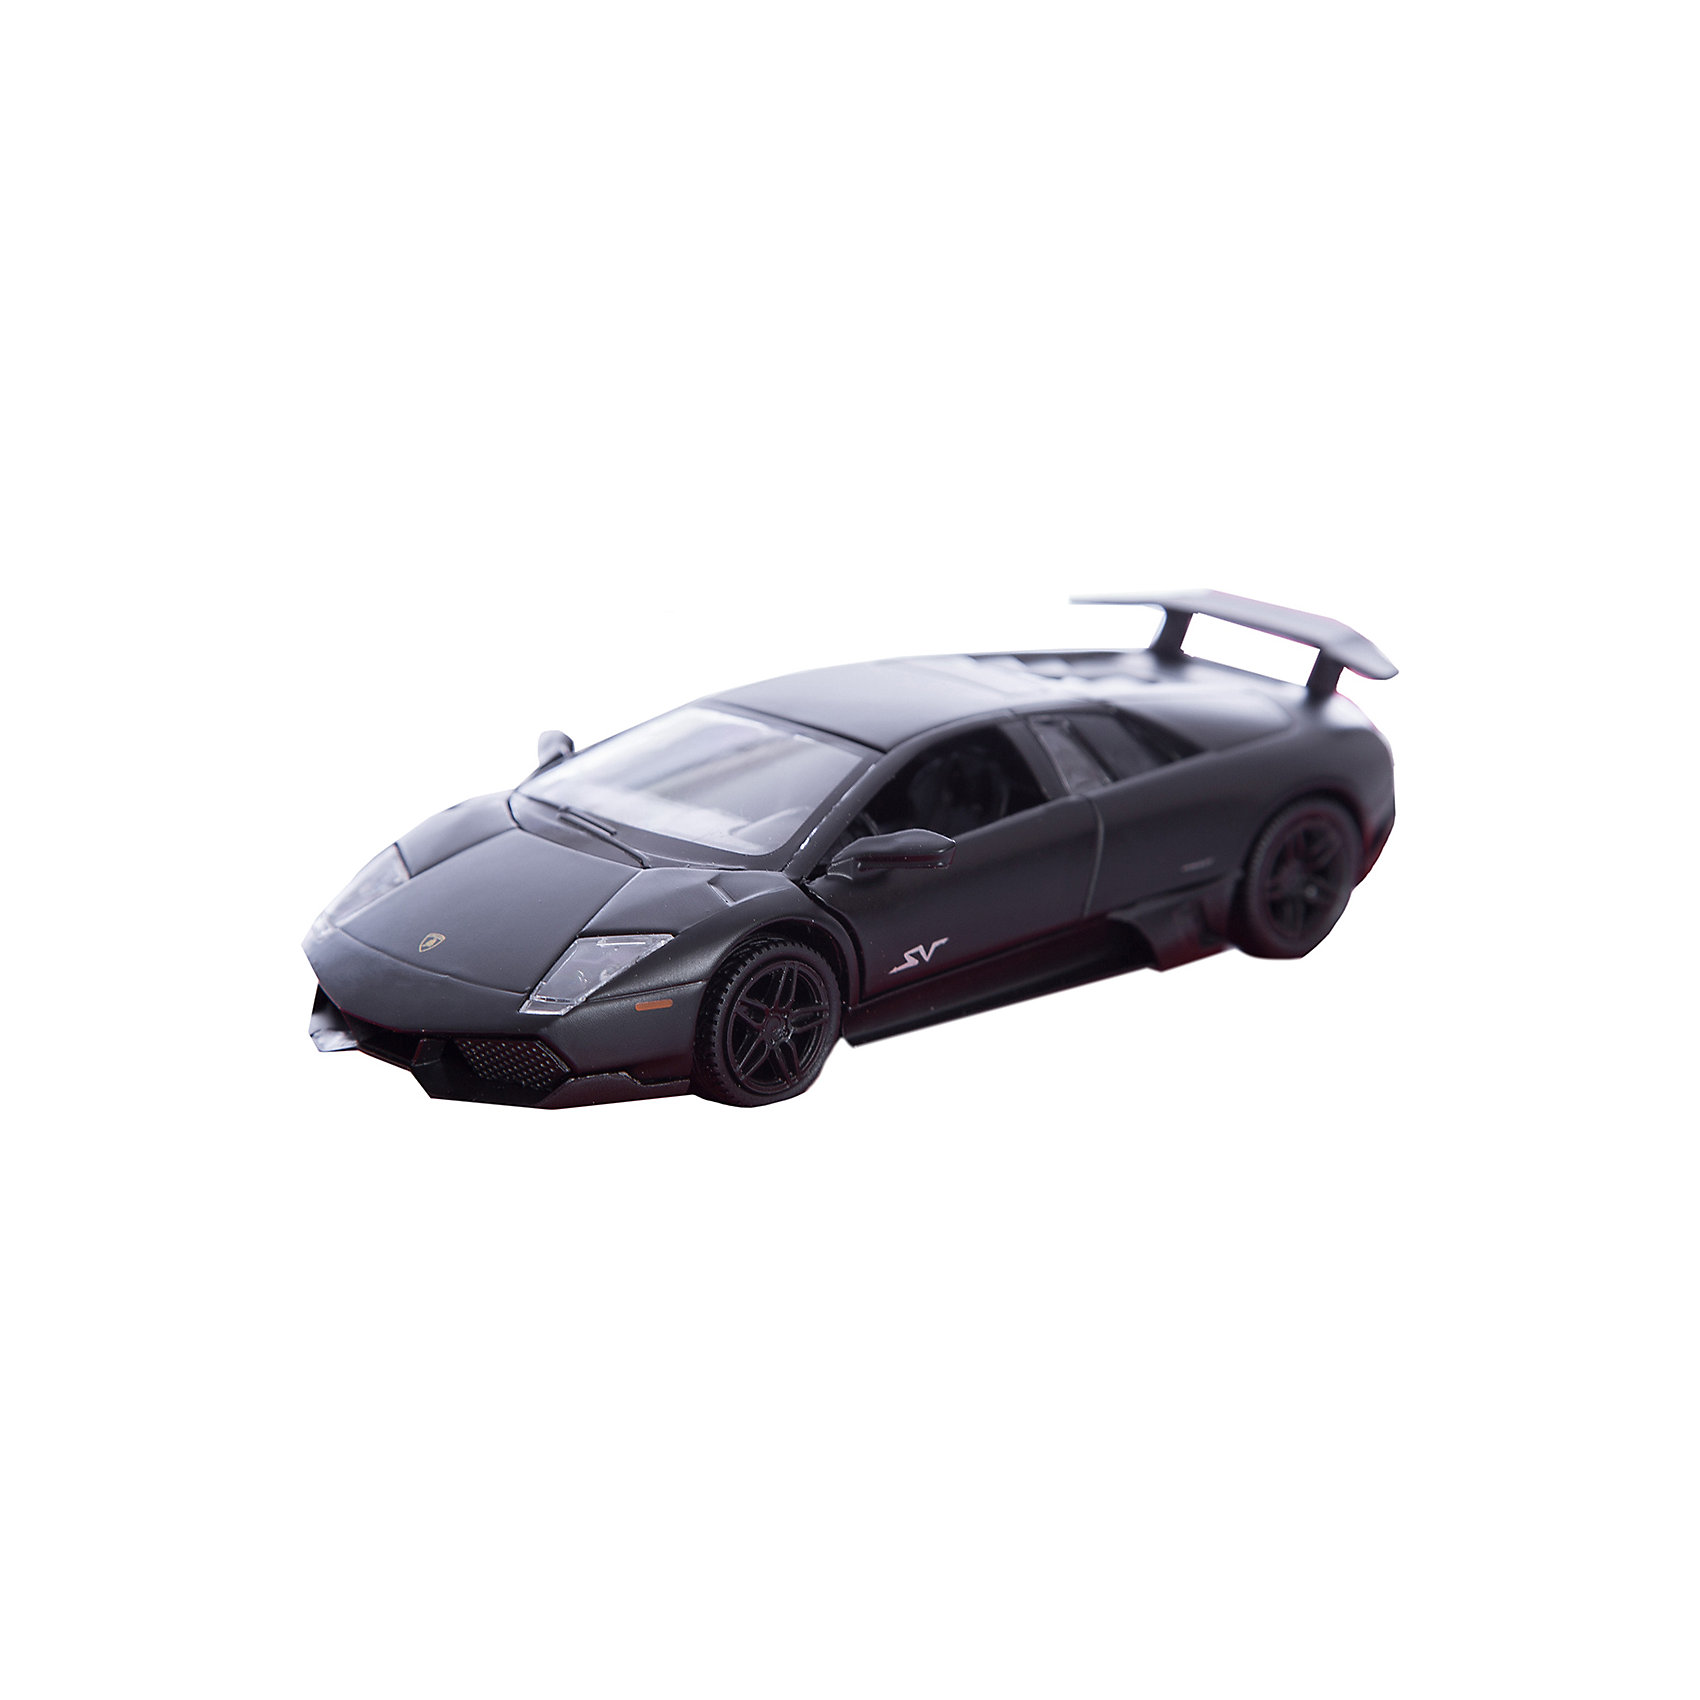 Машинка Lamborghini Murcielago LP670-4 SV Imperial Black Edition 5, AutotimeМашинки<br><br><br>Ширина мм: 165<br>Глубина мм: 57<br>Высота мм: 75<br>Вес г: 15<br>Возраст от месяцев: 36<br>Возраст до месяцев: 2147483647<br>Пол: Мужской<br>Возраст: Детский<br>SKU: 5584117